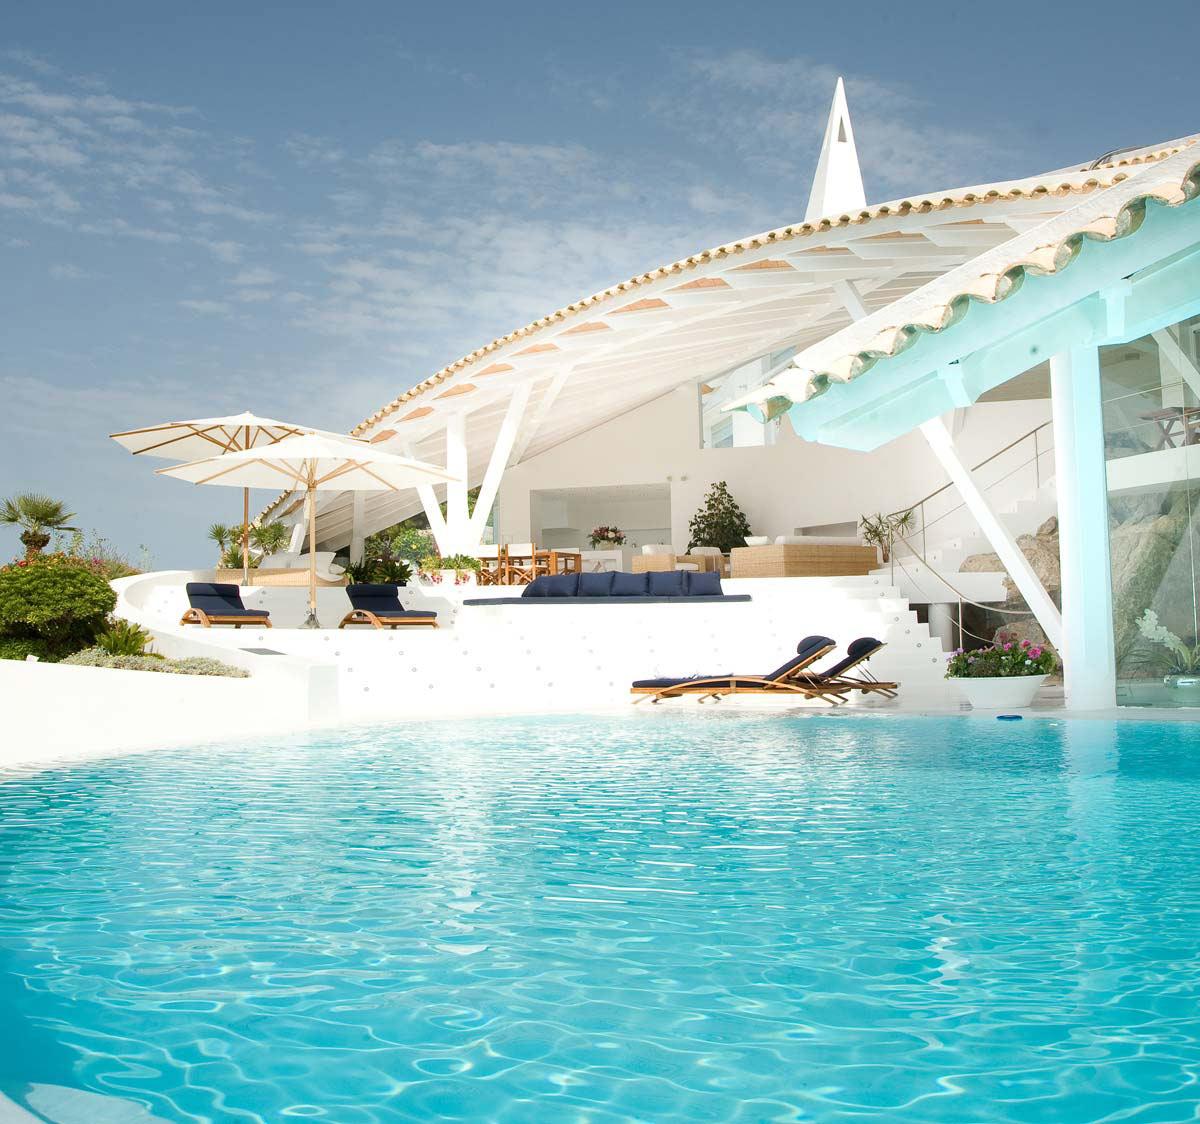 Mediterranean Paradise: Mallorcan Villa by Alberto Rubio